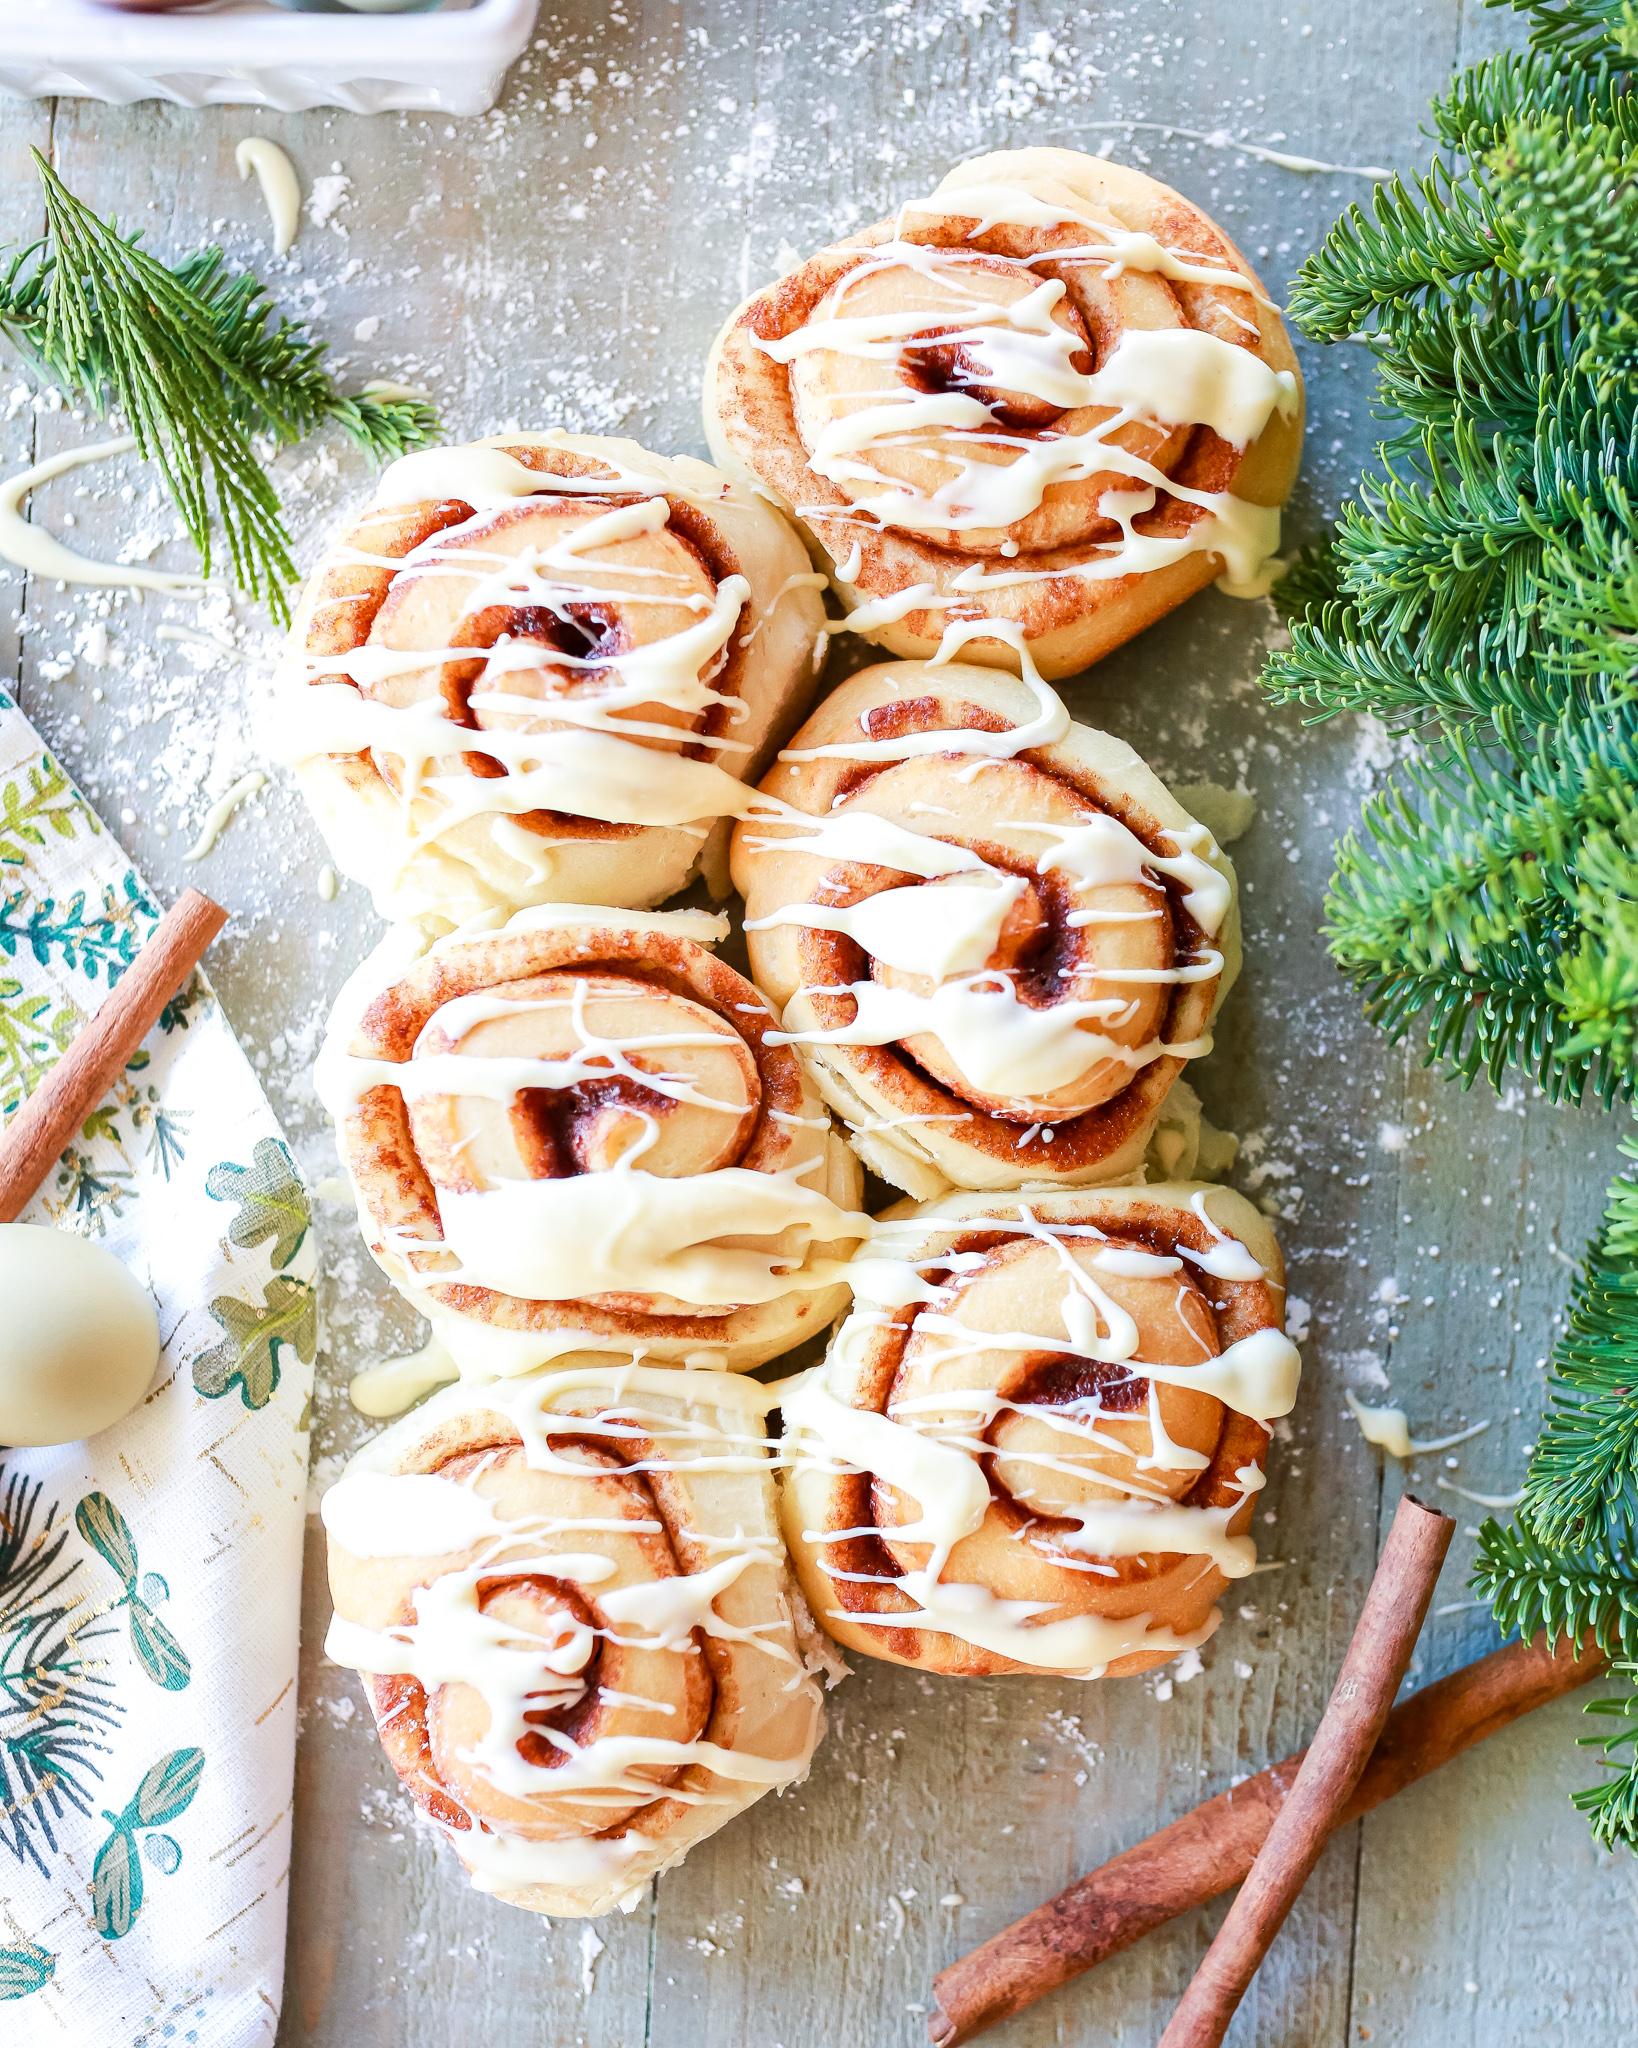 Egg nog cinnamon rolls recipe